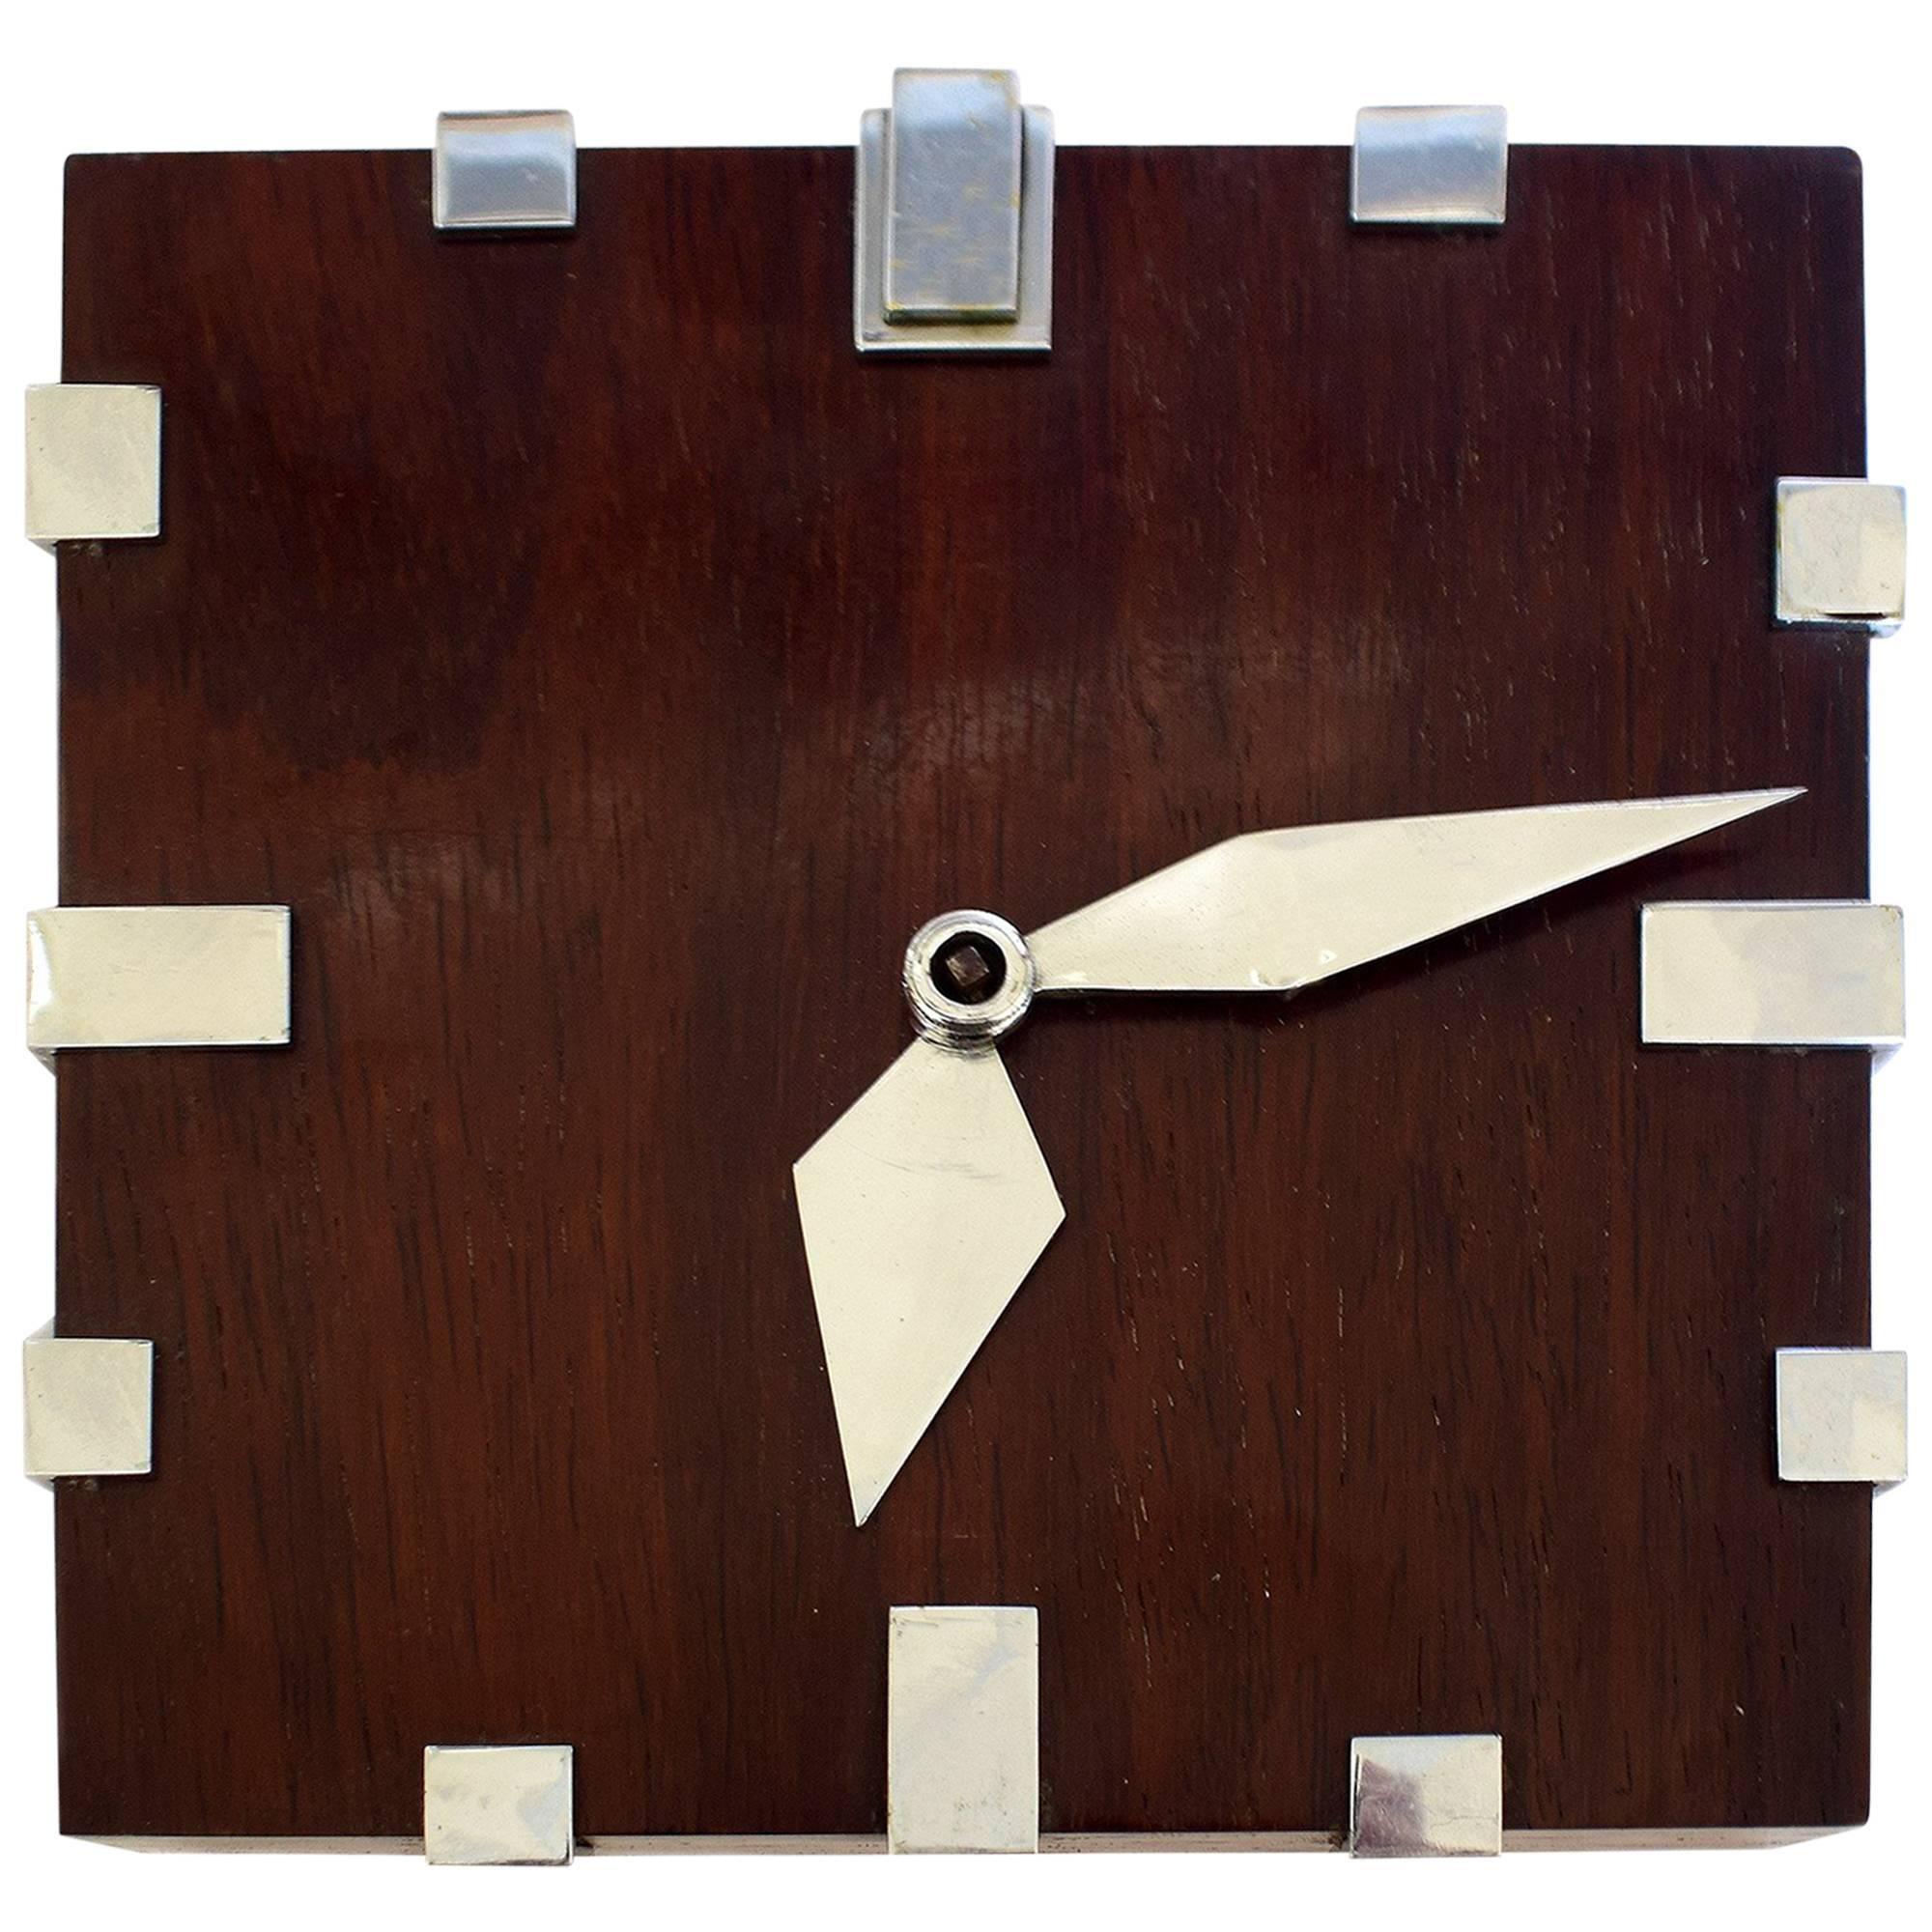 Rare Modernist 1930s Wall Clock 18 Day Movement